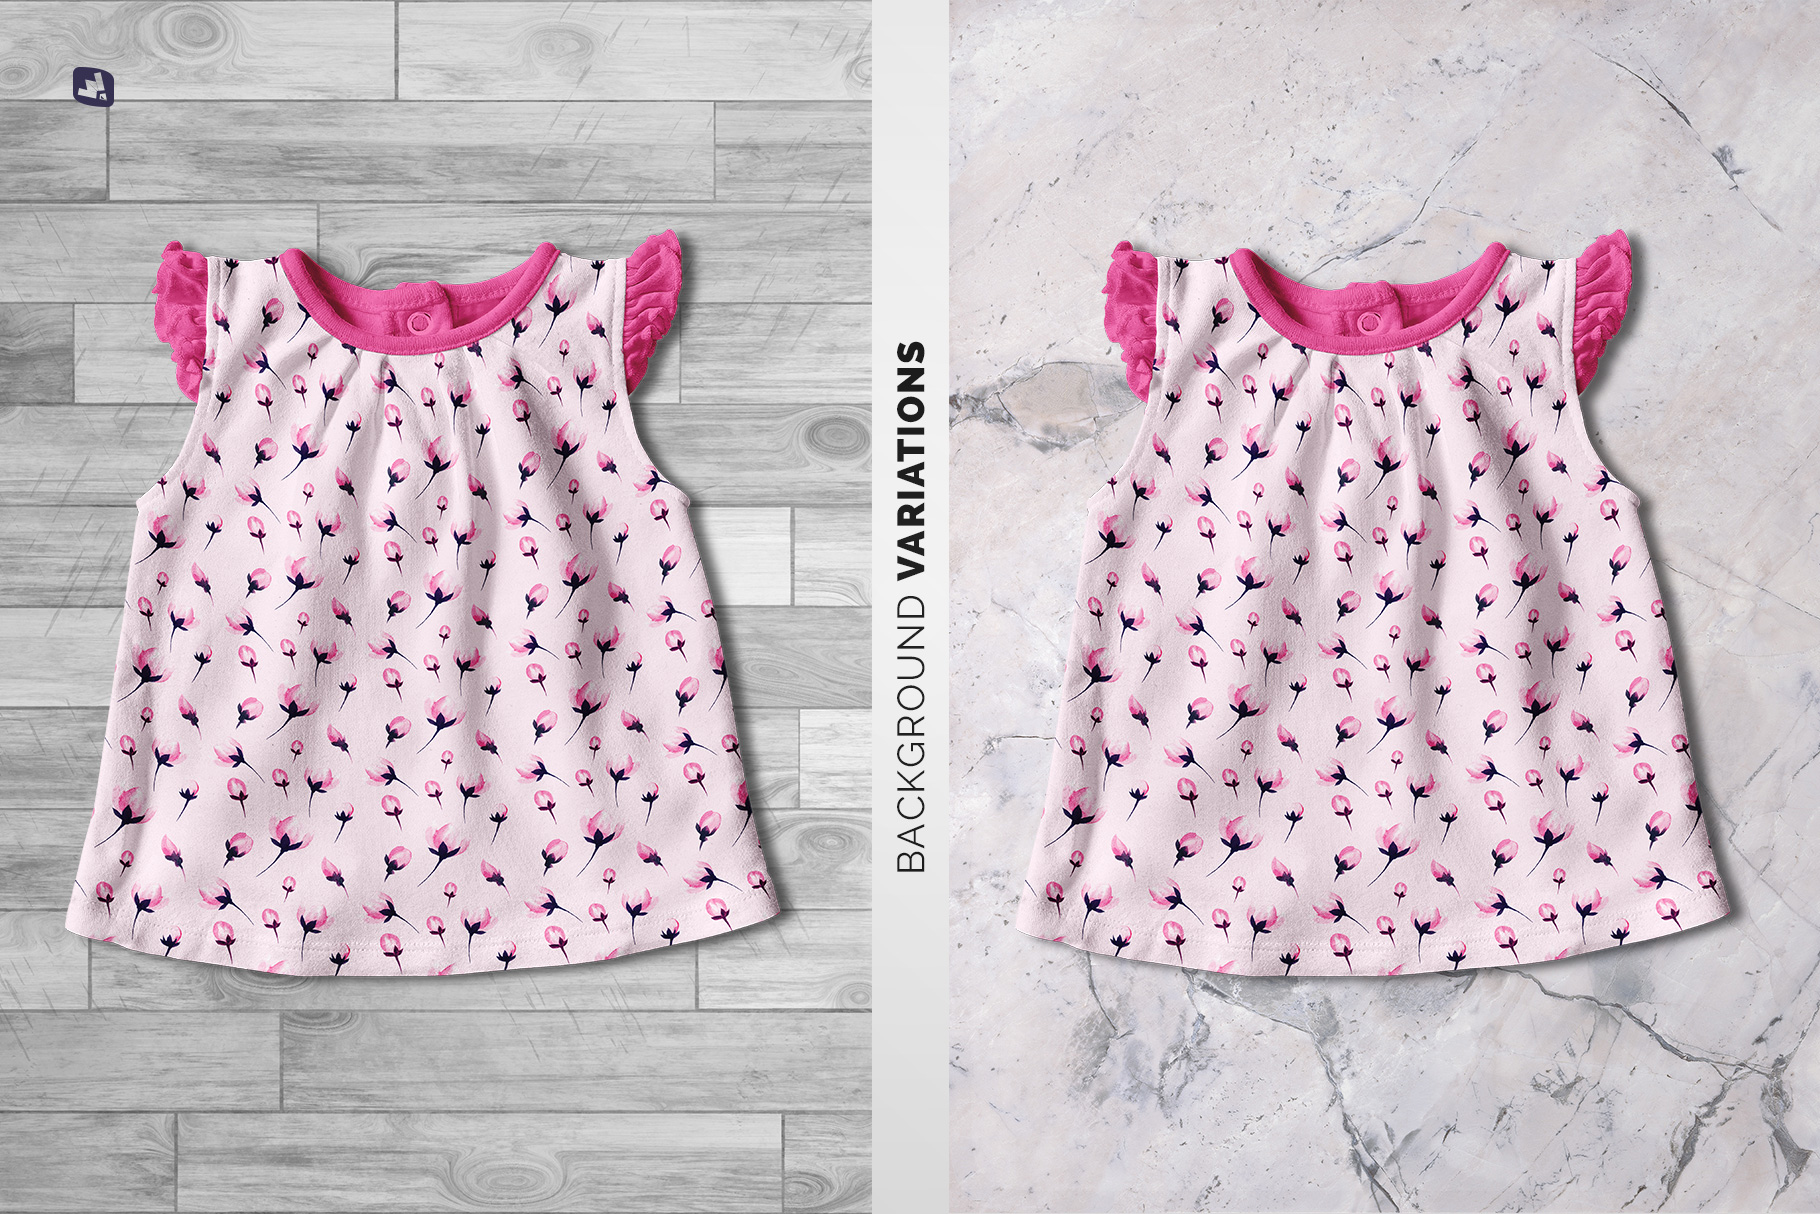 background options of the ruffle sleeve baby girl top mockup